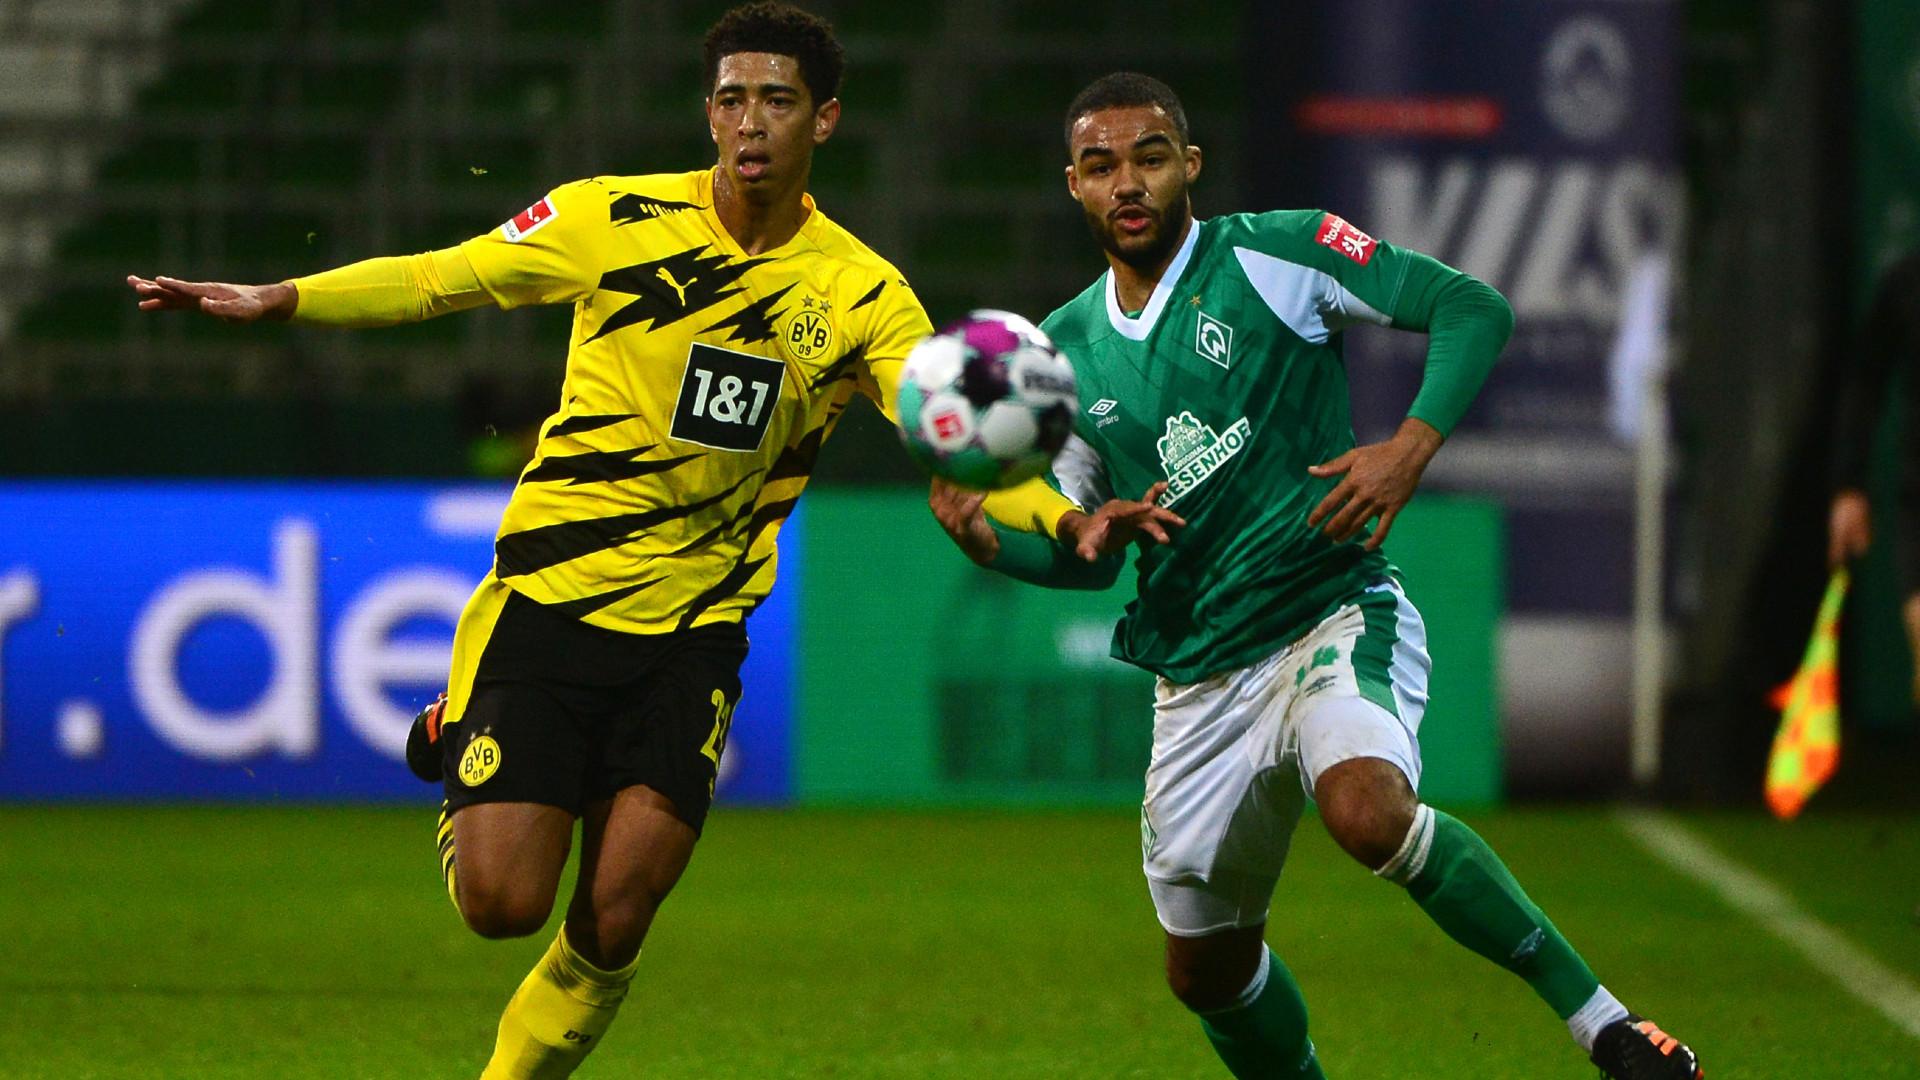 Off Programm Stadionheft BVB Borussia Dortmund v Werder Bremen Bundesliga 19//20